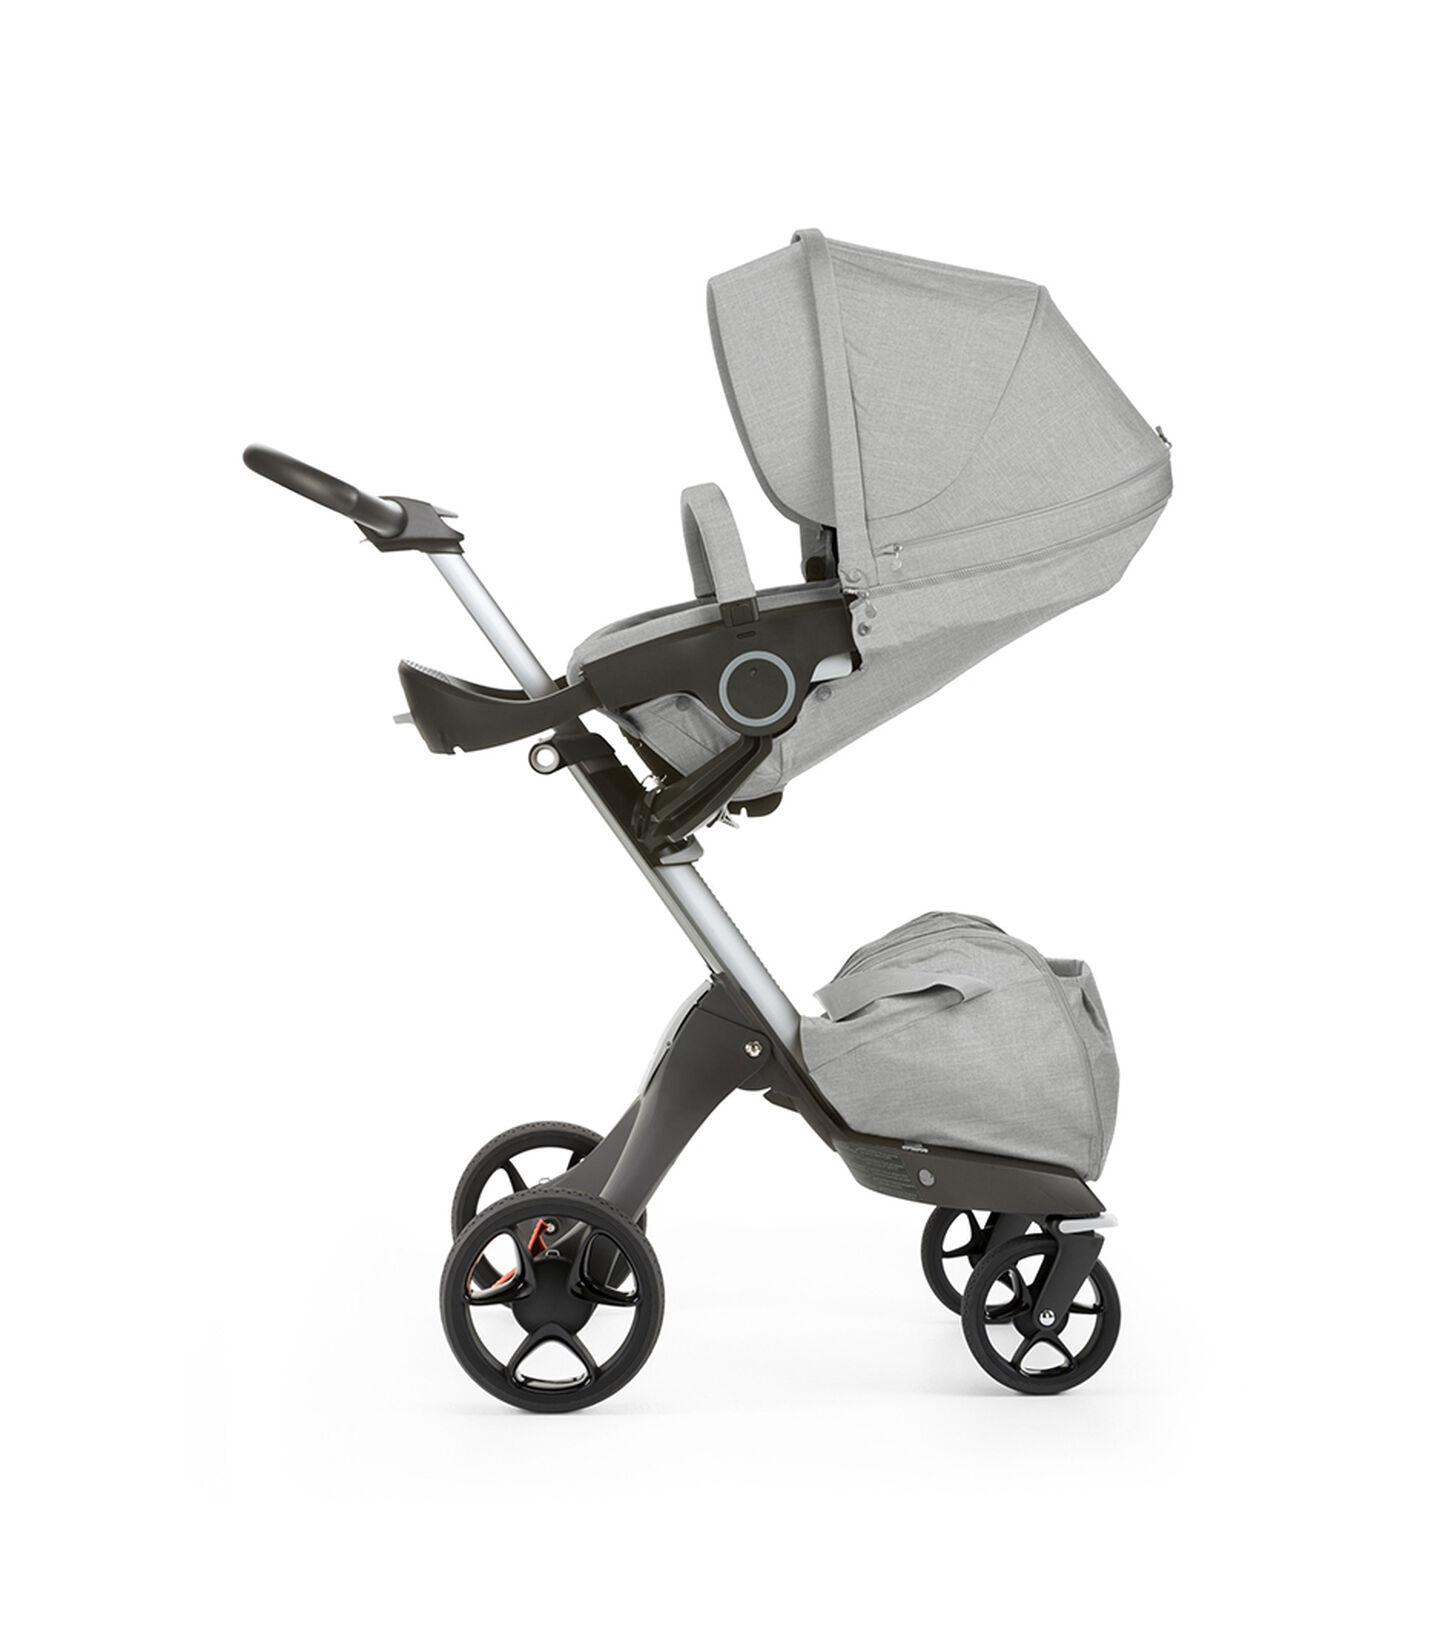 Stokke® Xplory® with Stokke® Stroller Seat, parent facing, sleep position. Grey Melange. New wheels 2016.